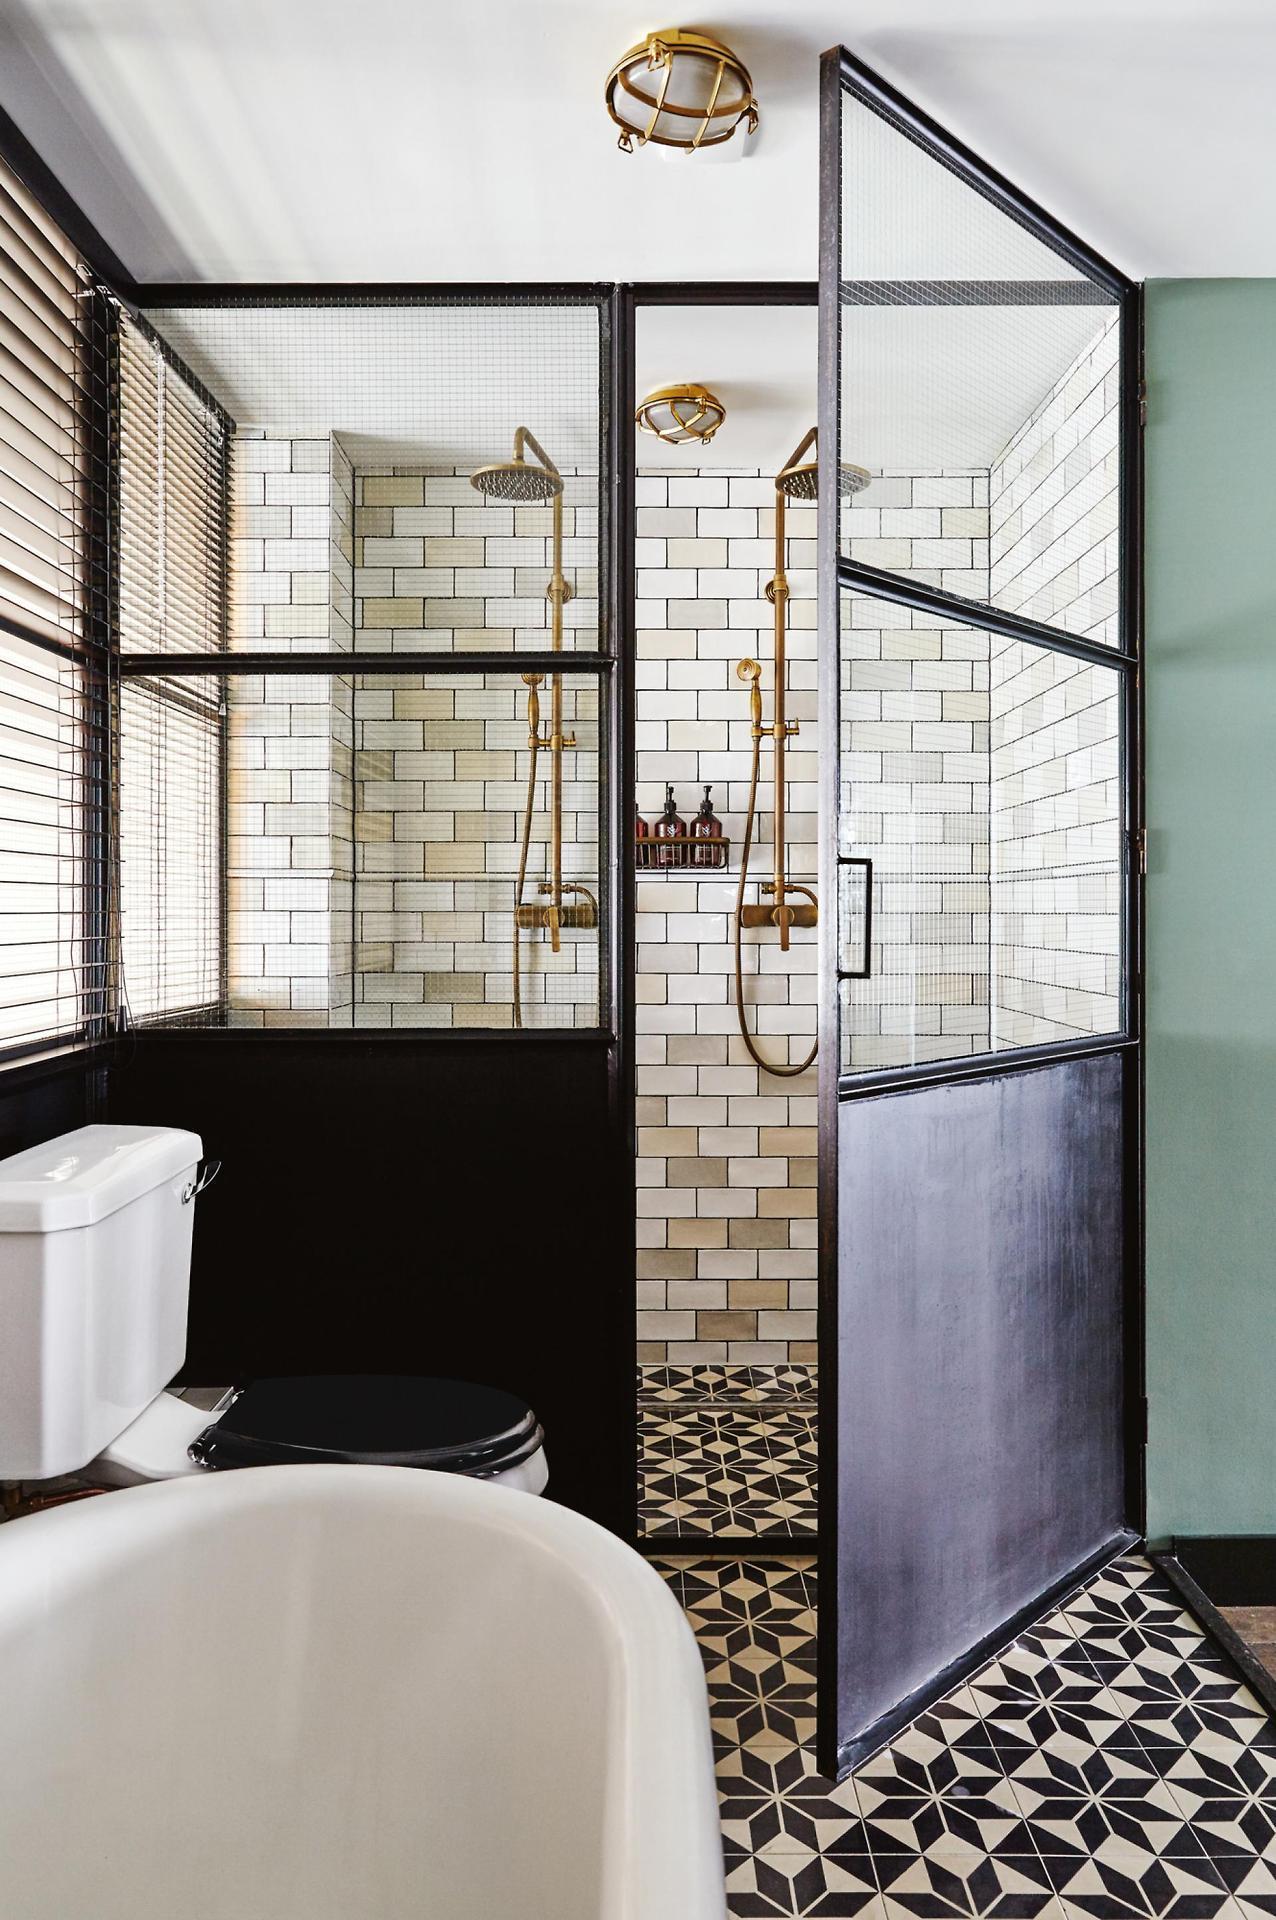 The Nordroom - 25 Inspiring Bathrooms With Geometric Tiles  image: Alan Jensen